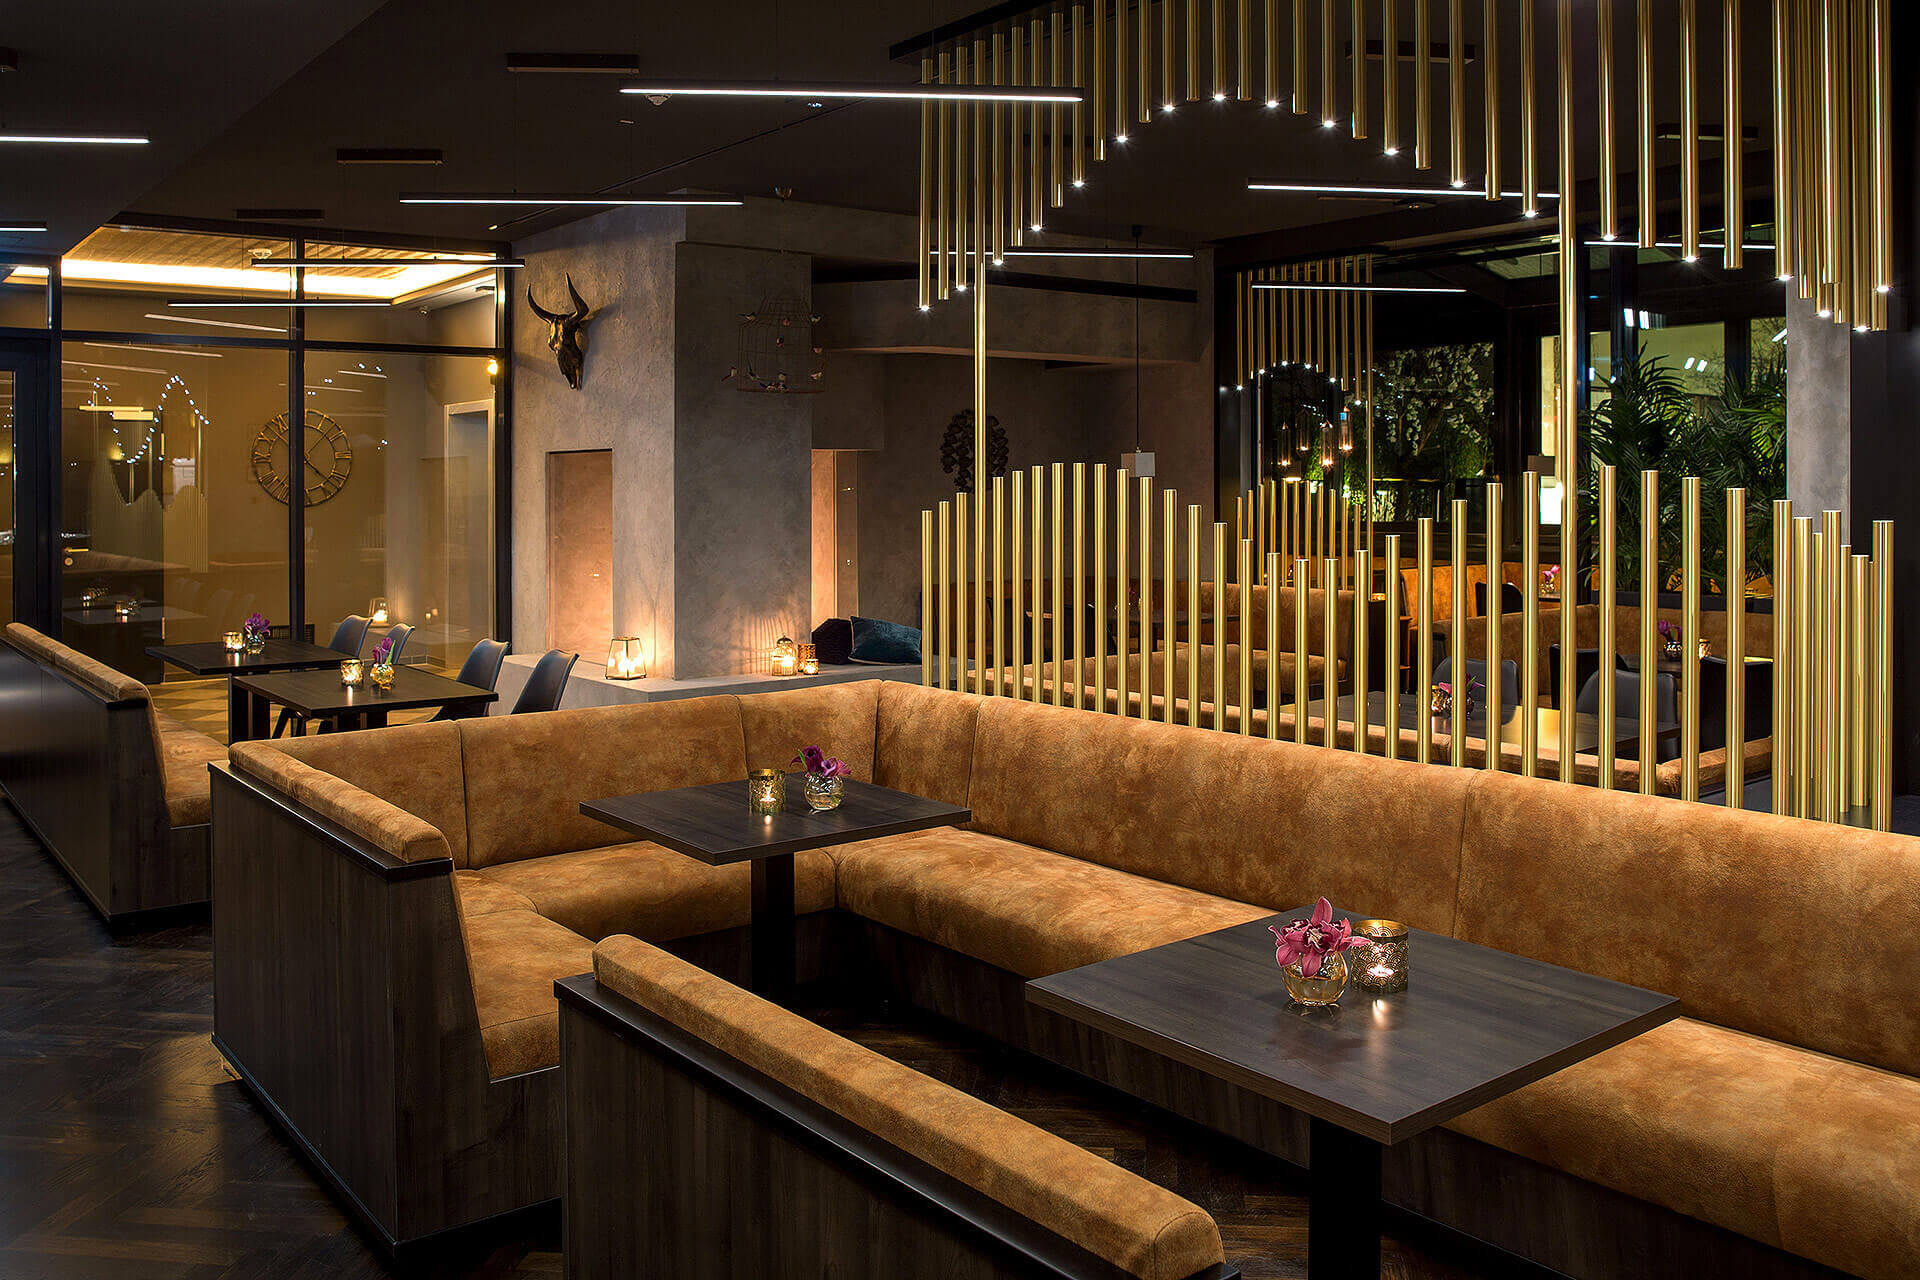 amano group boutique hotels restaurants bars berlin. Black Bedroom Furniture Sets. Home Design Ideas